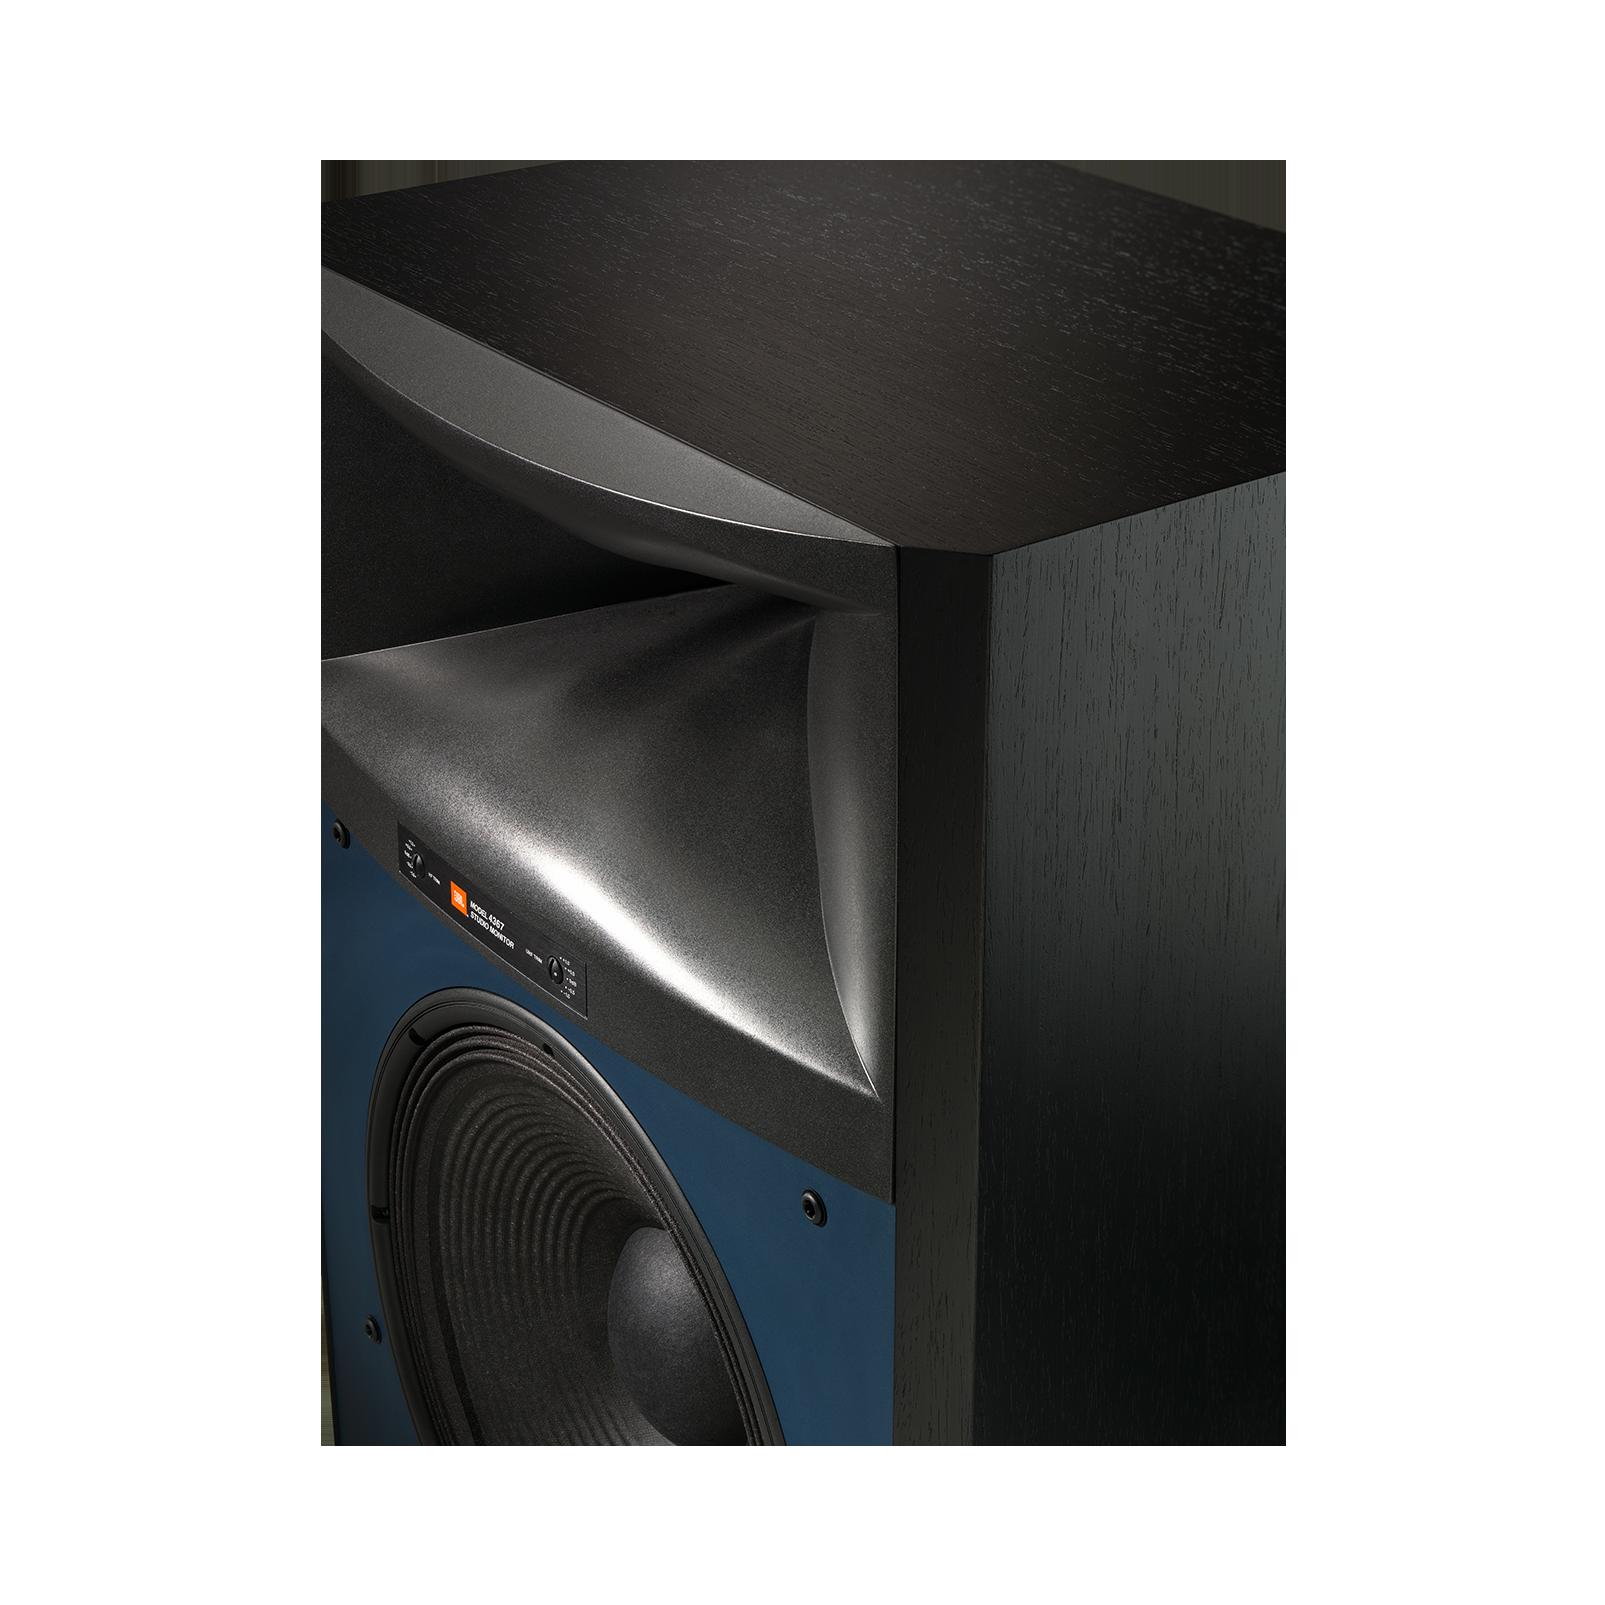 "4367 - Black - 2-way 15"" (380mm) Floorstanding Studio Monitor Loudspeaker - Detailshot 3"